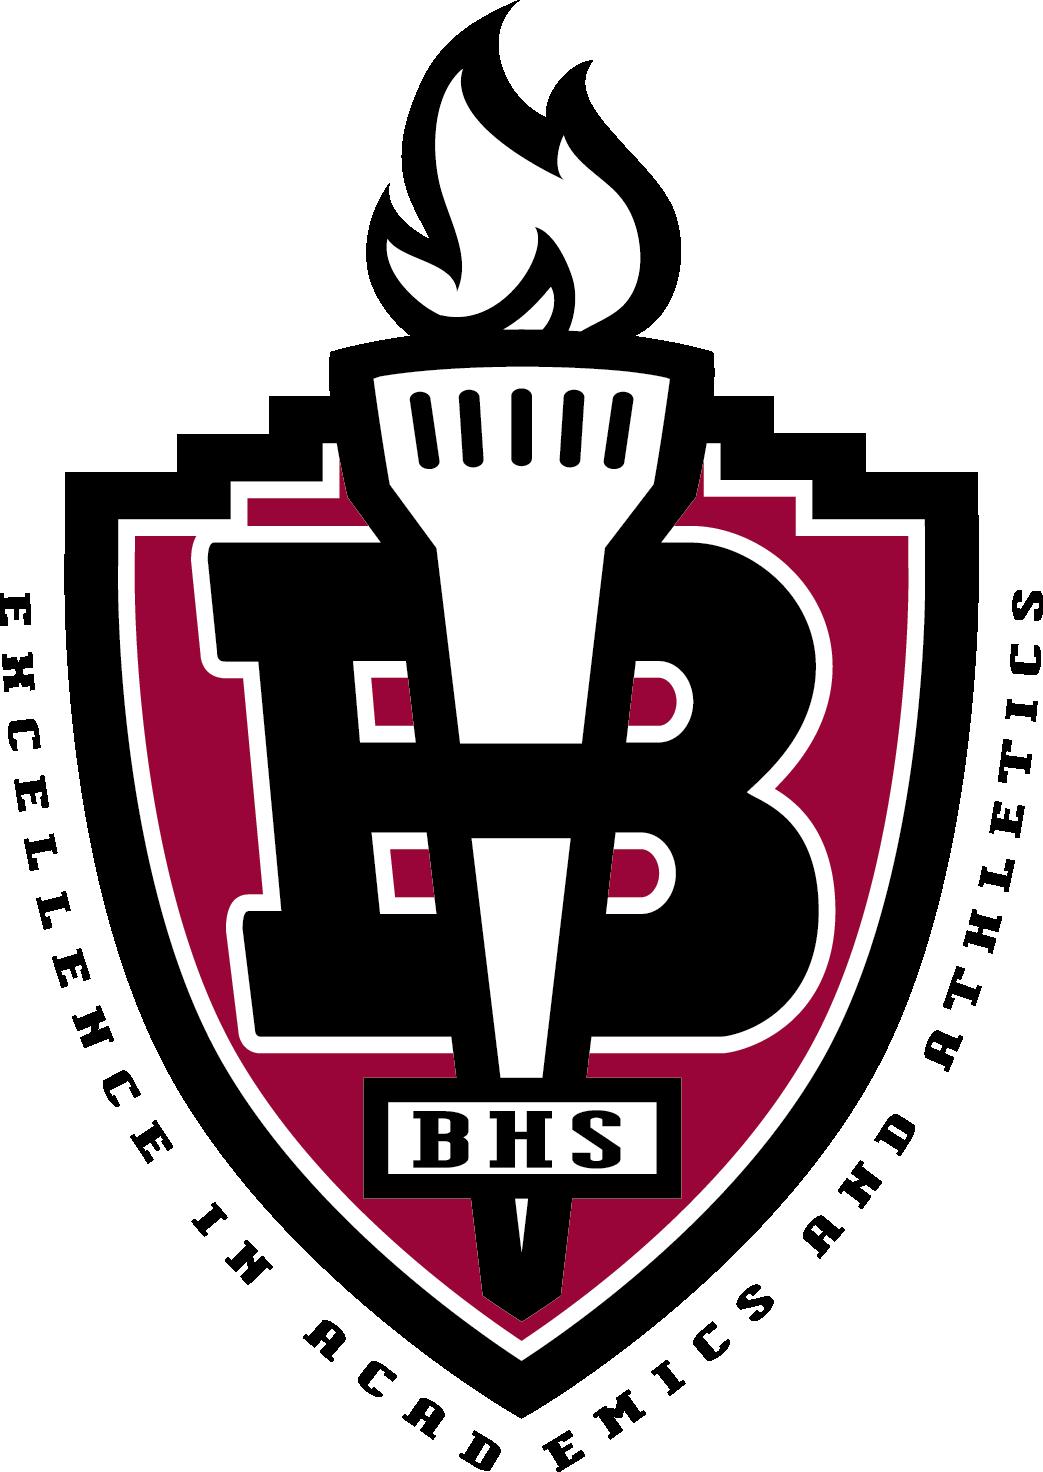 BHS-AcademicLogo